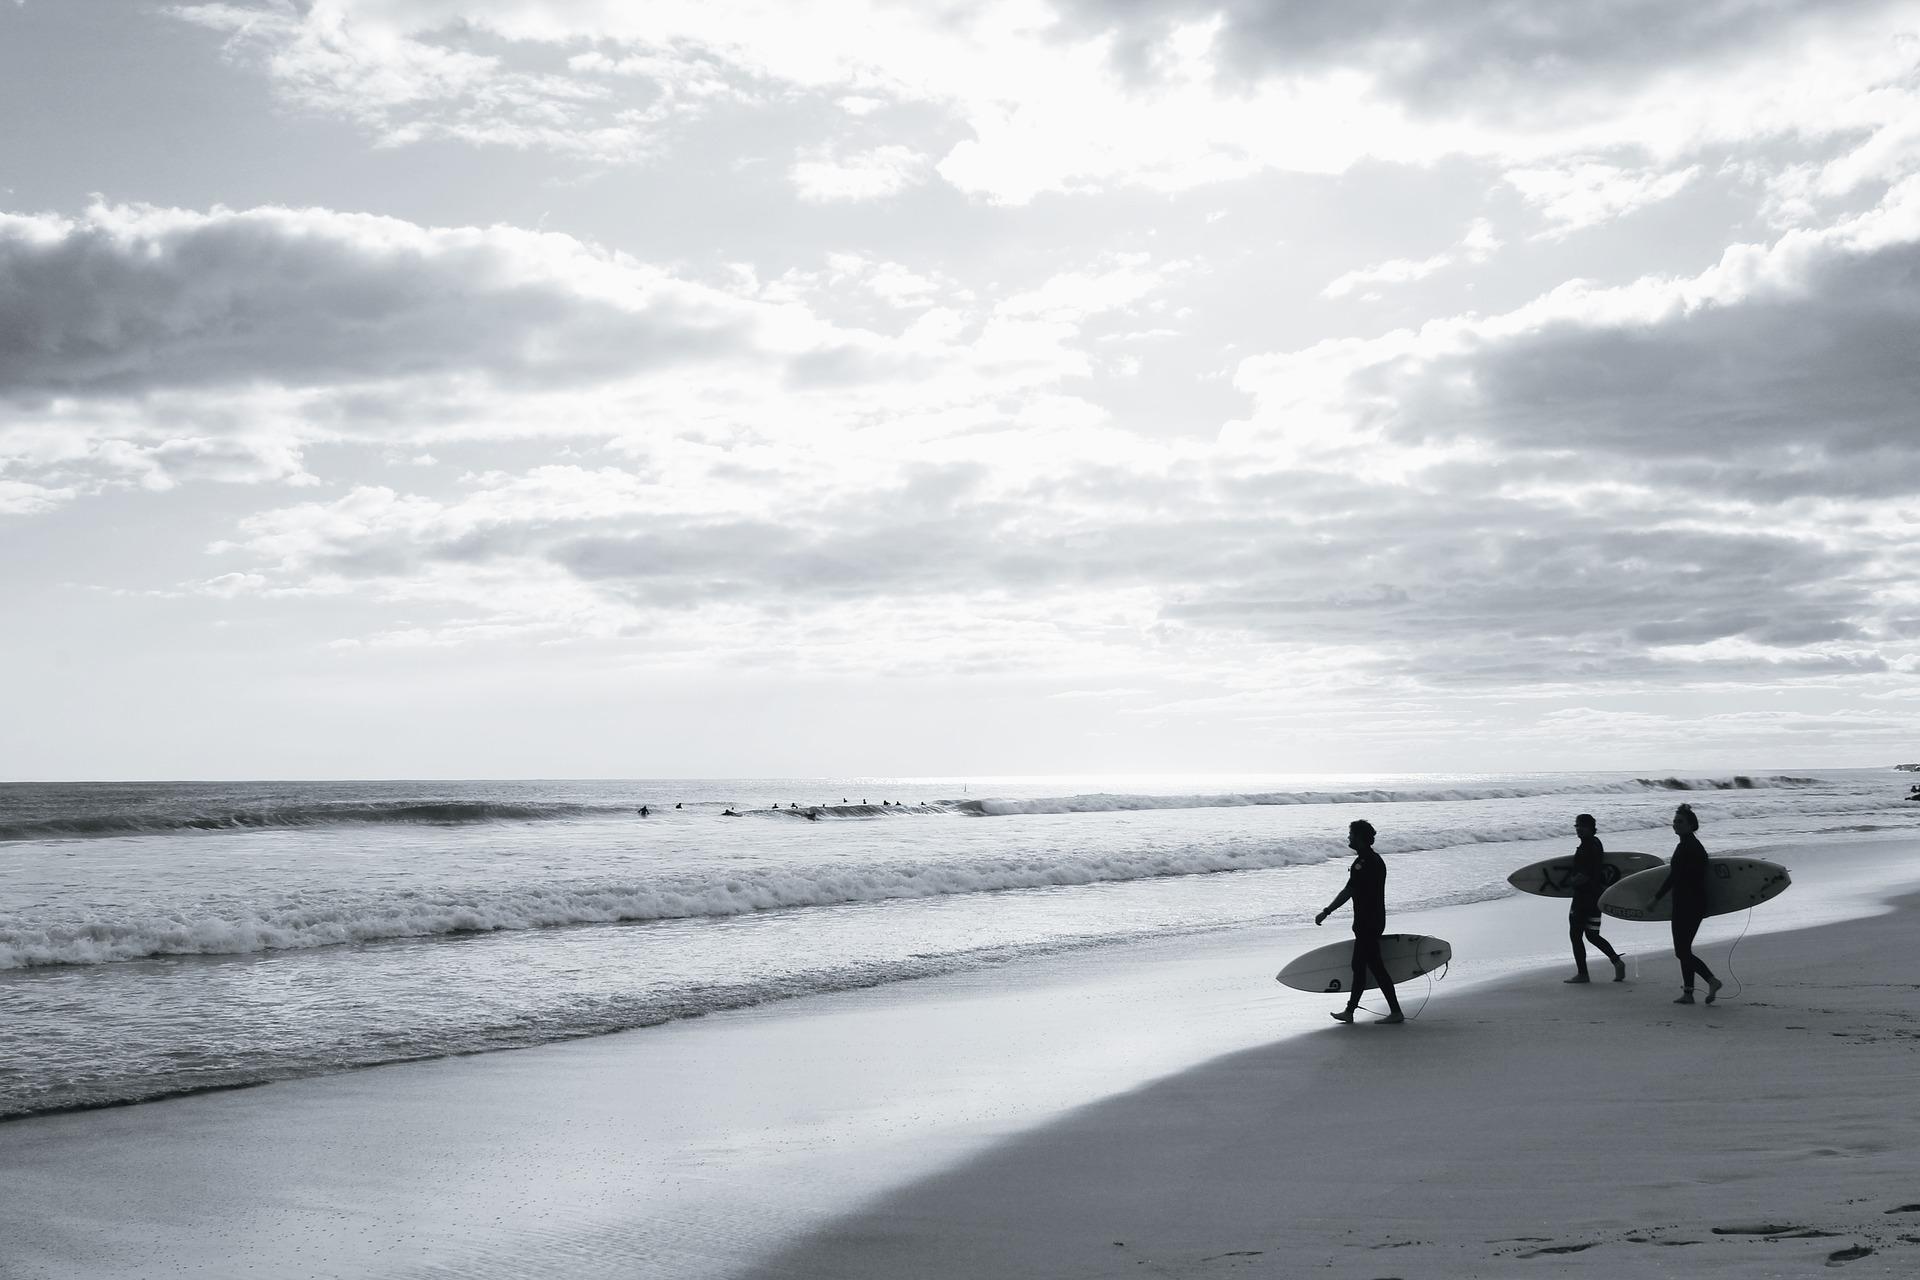 Surfing with friends in secret surf spots in Santa Teresa Costa Rica